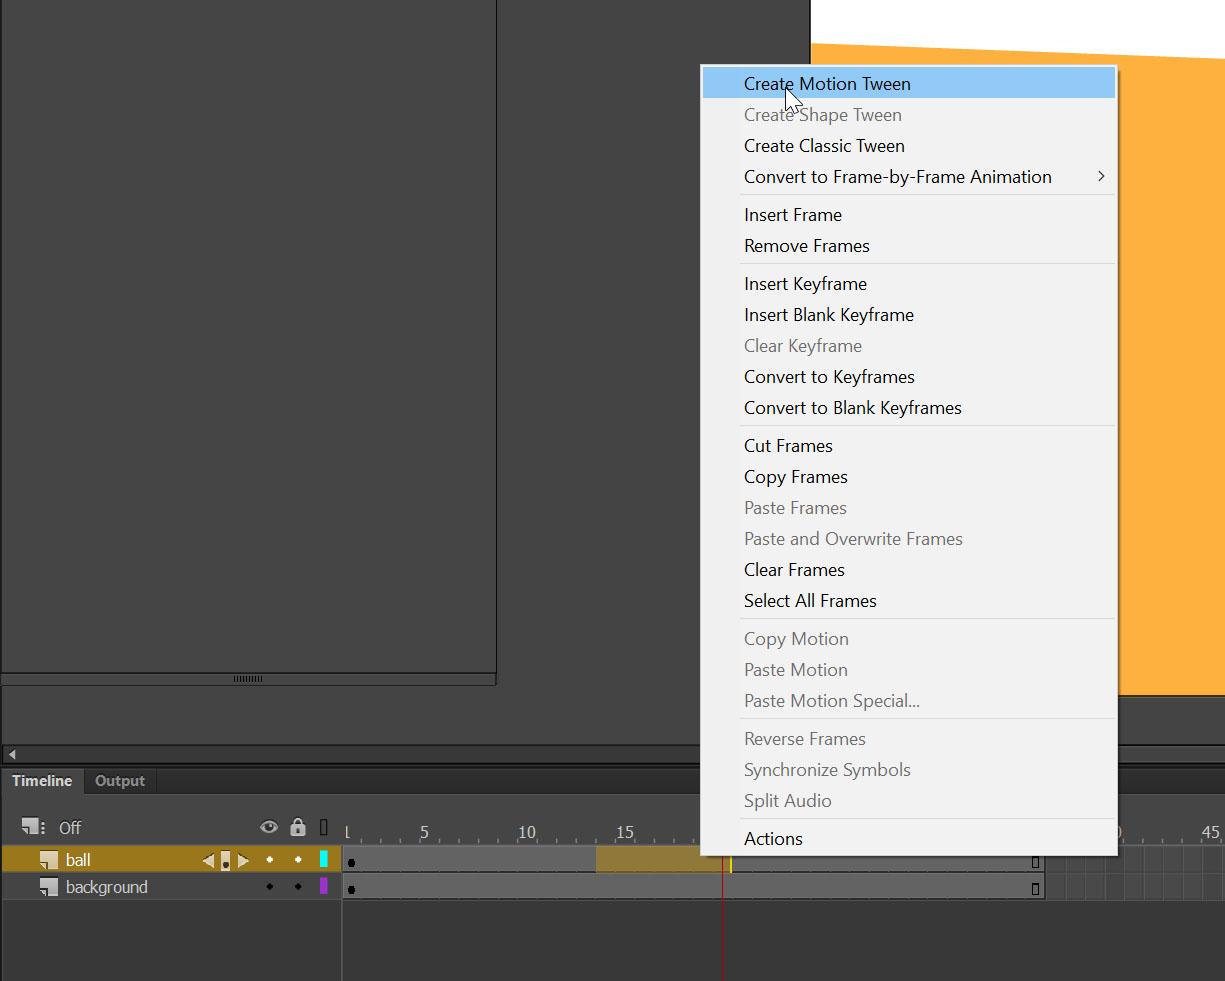 Adobe Animate animation techniques